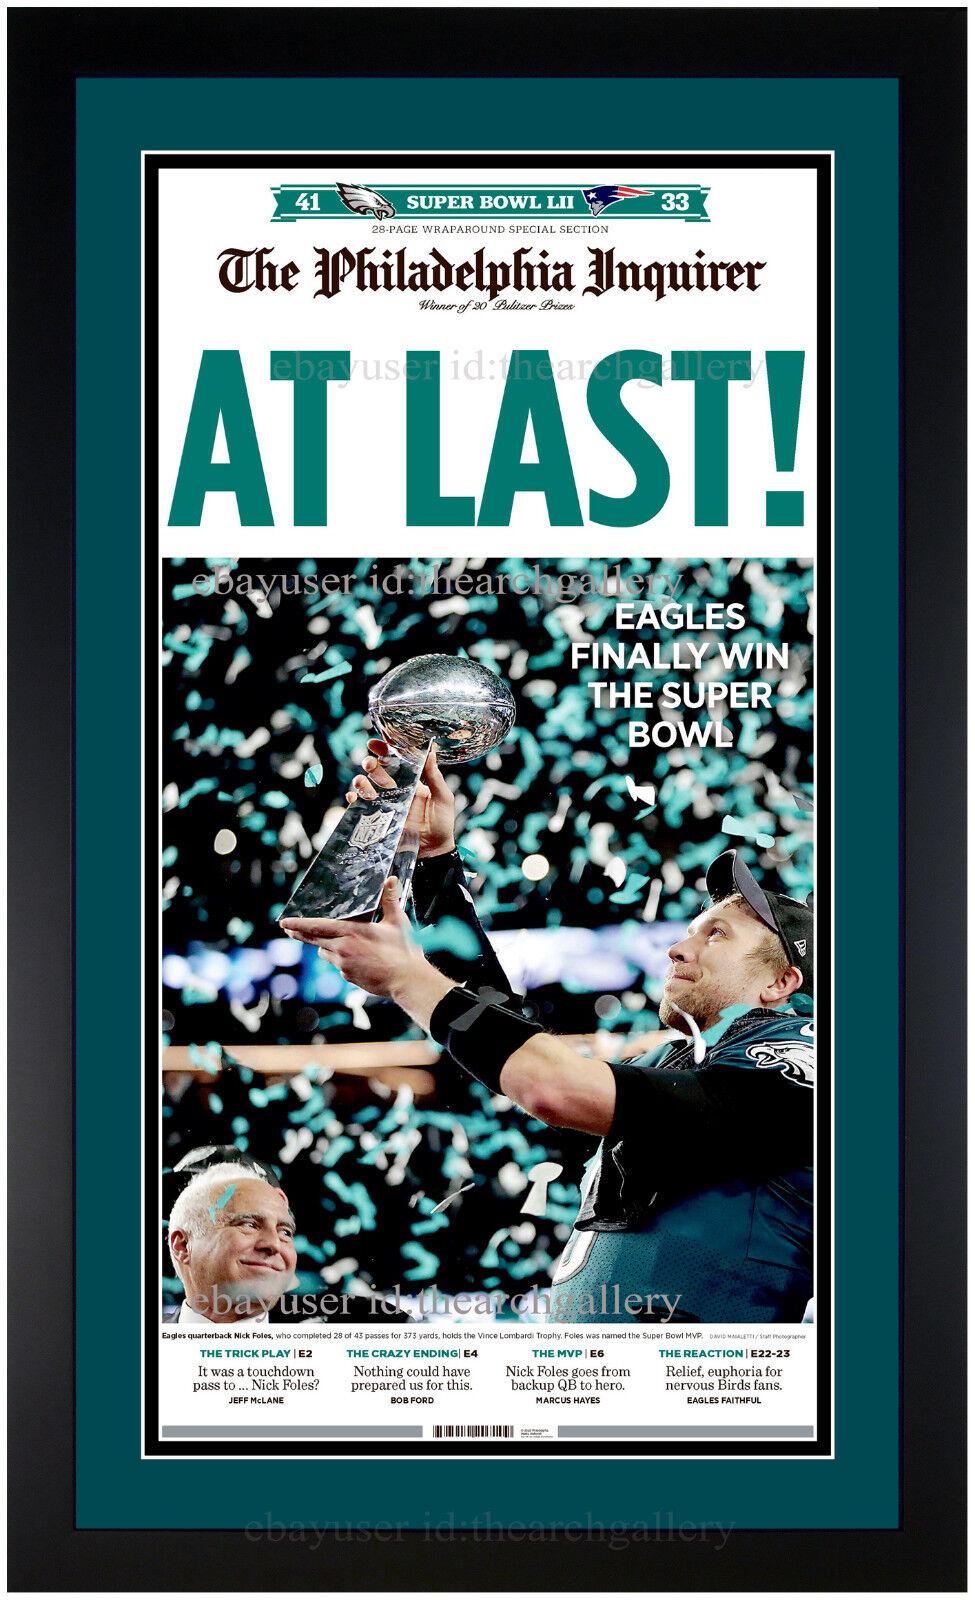 Купить Janout Fine Framing - Philadelphia Eagles Super Bowl LII Champions Inquirer Newspaper Framed 2-5-2018